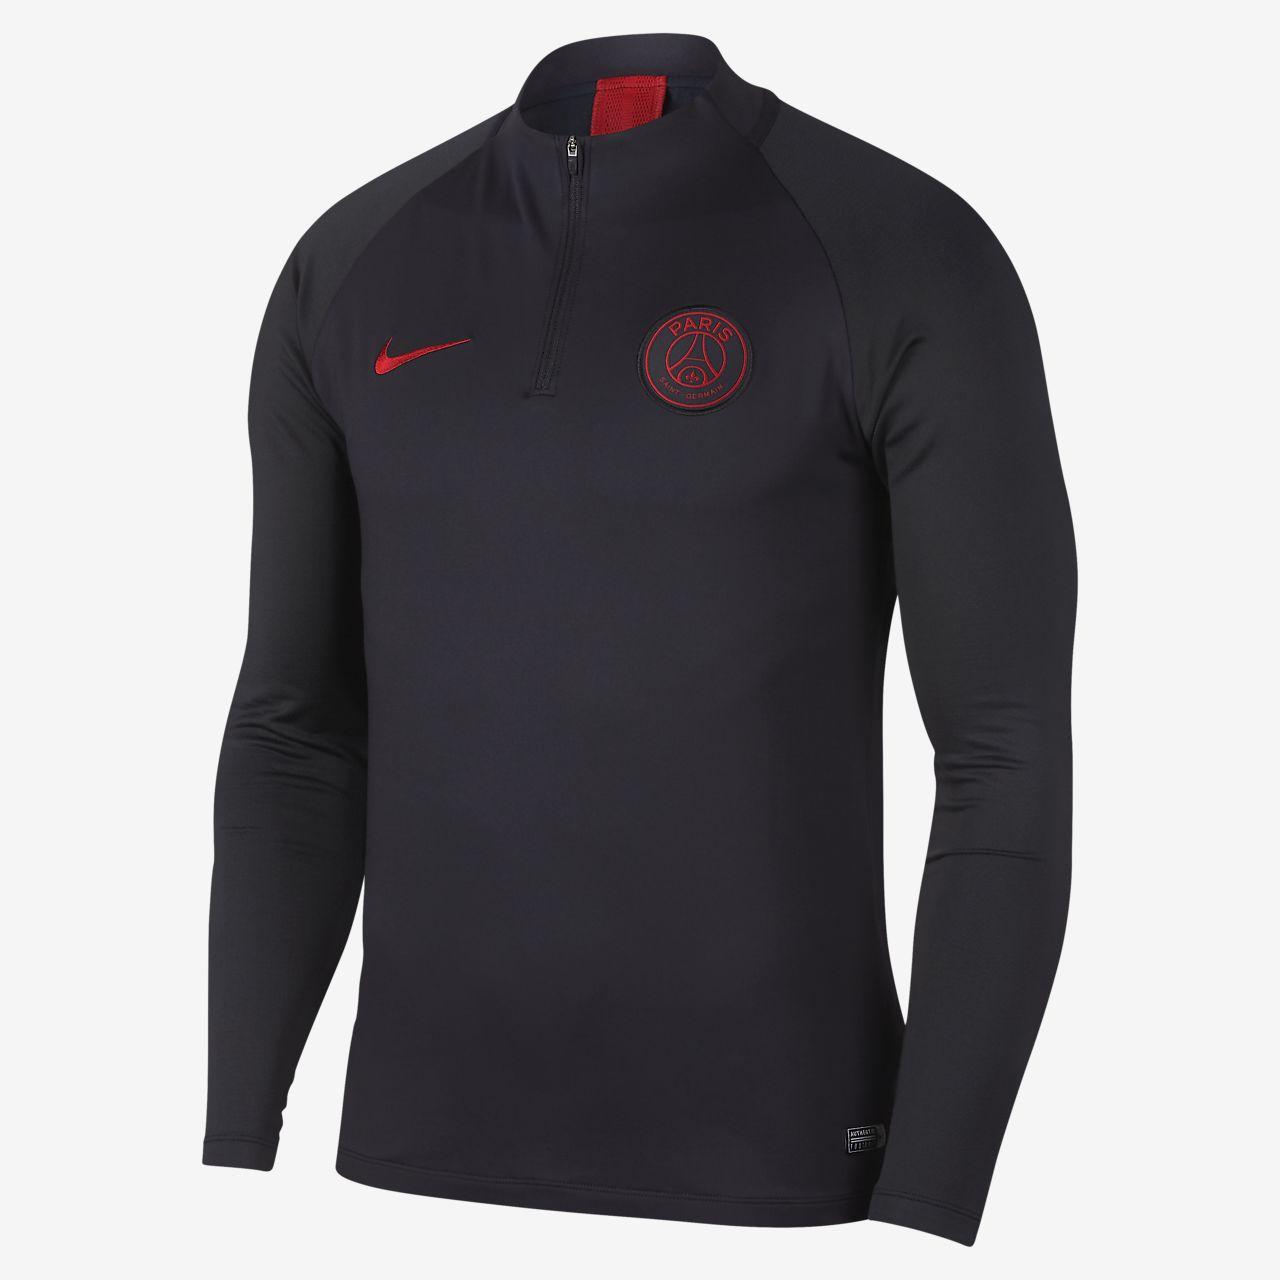 Fotbollströja Nike Dri-FIT Paris Saint-Germain Strike för män